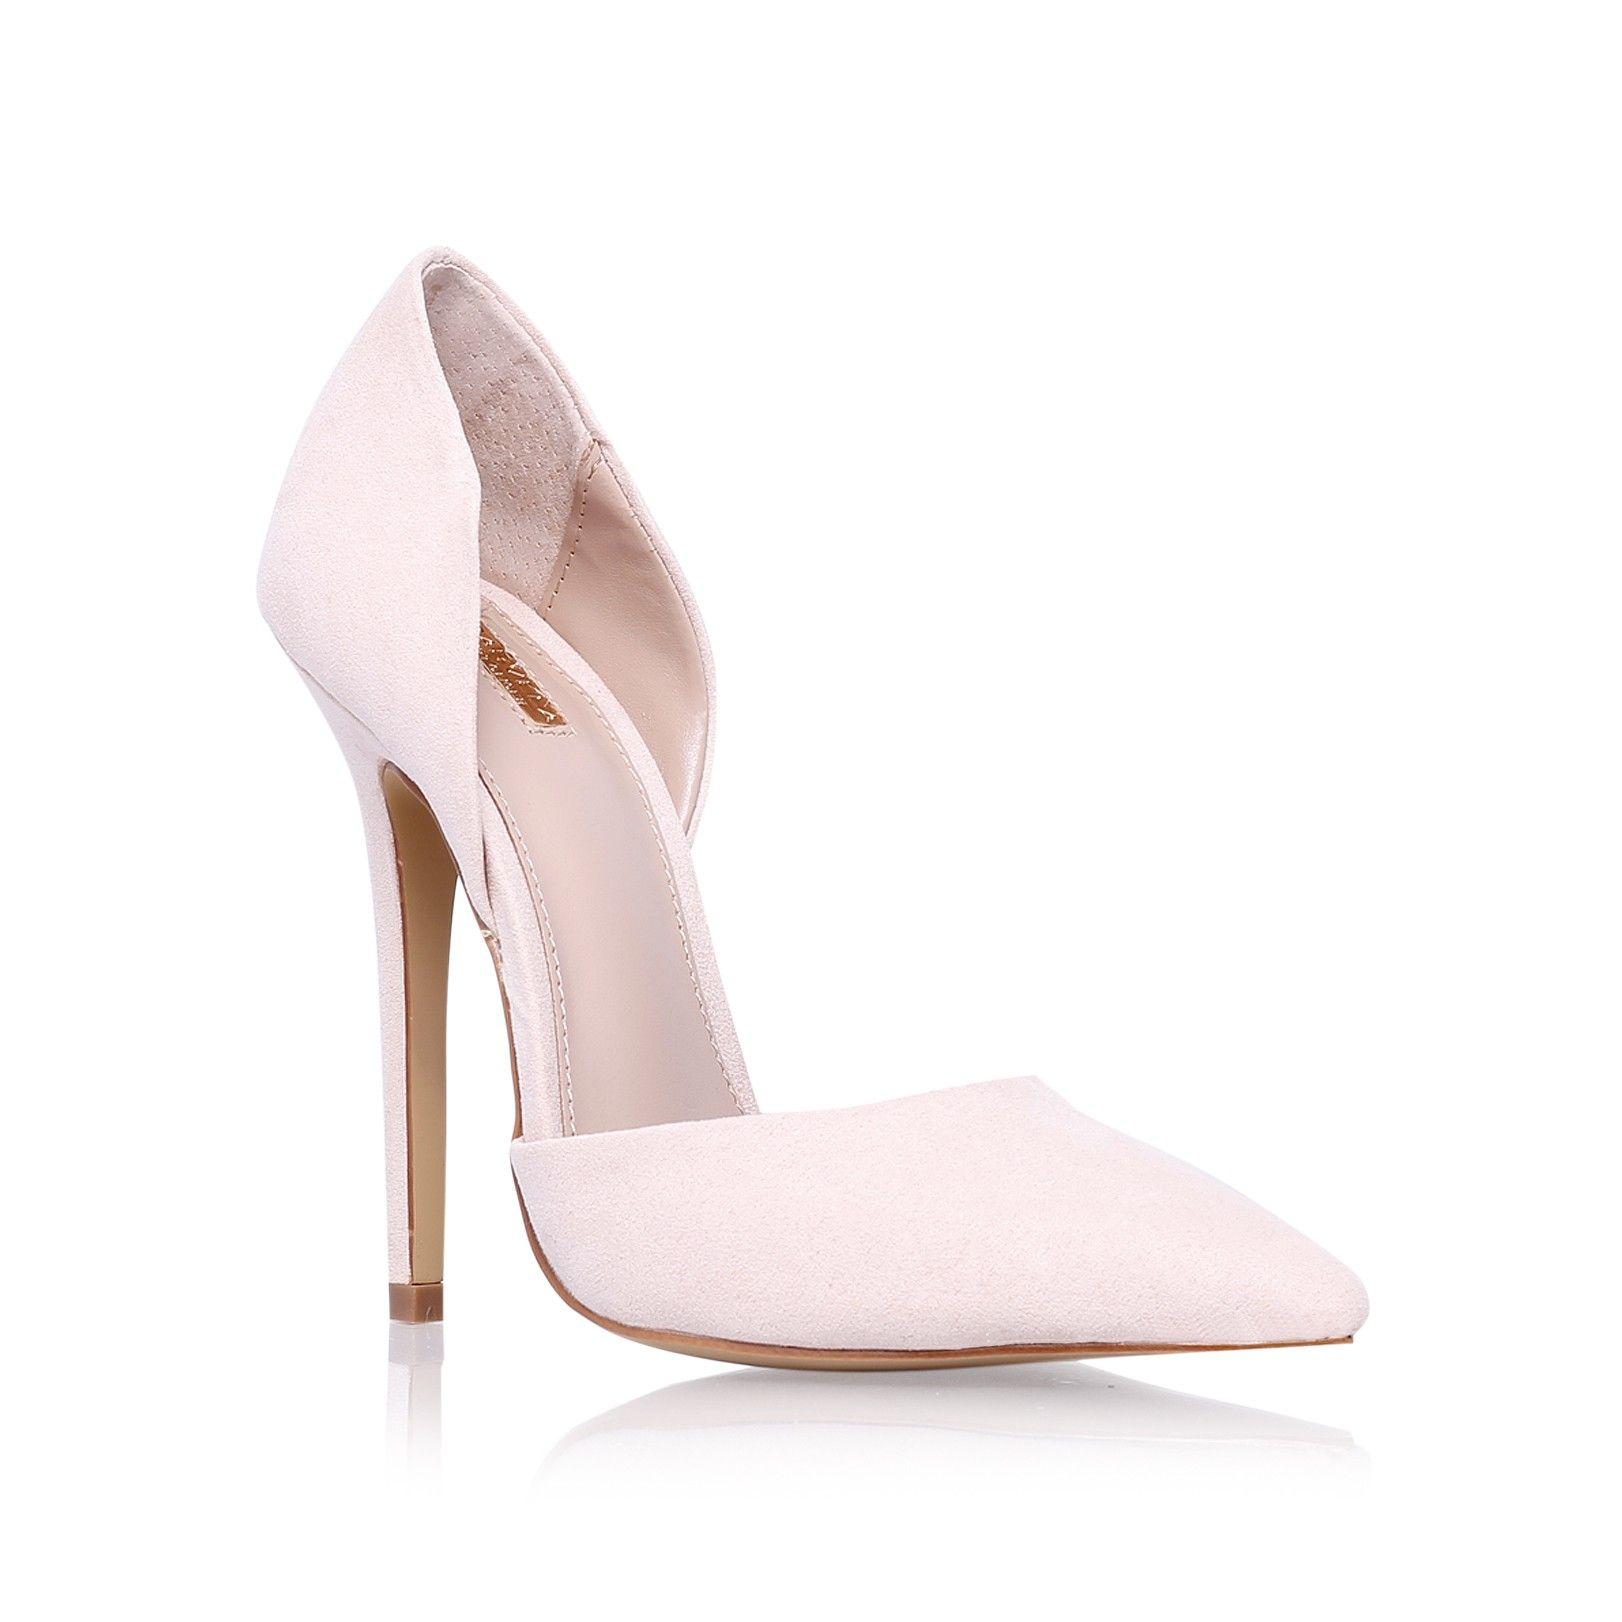 Nude High Heel Court Shoes